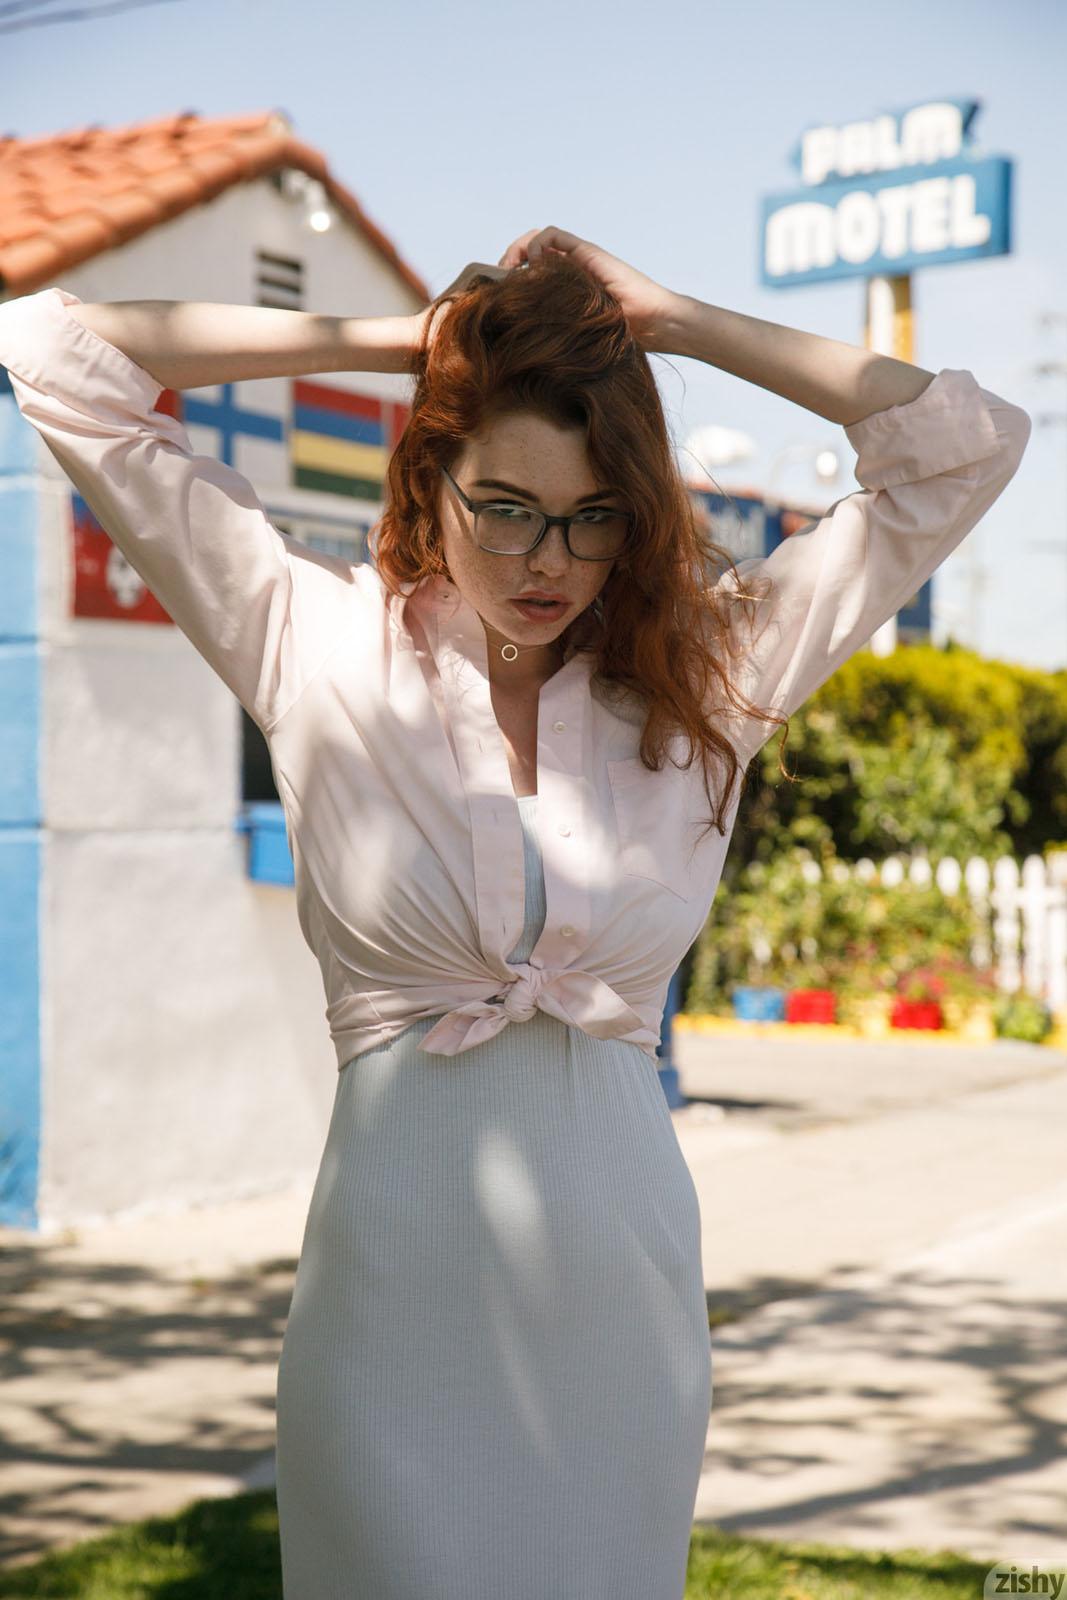 Sabrina Lynn Pleasure Zishy nude pics - Bunnylust.com